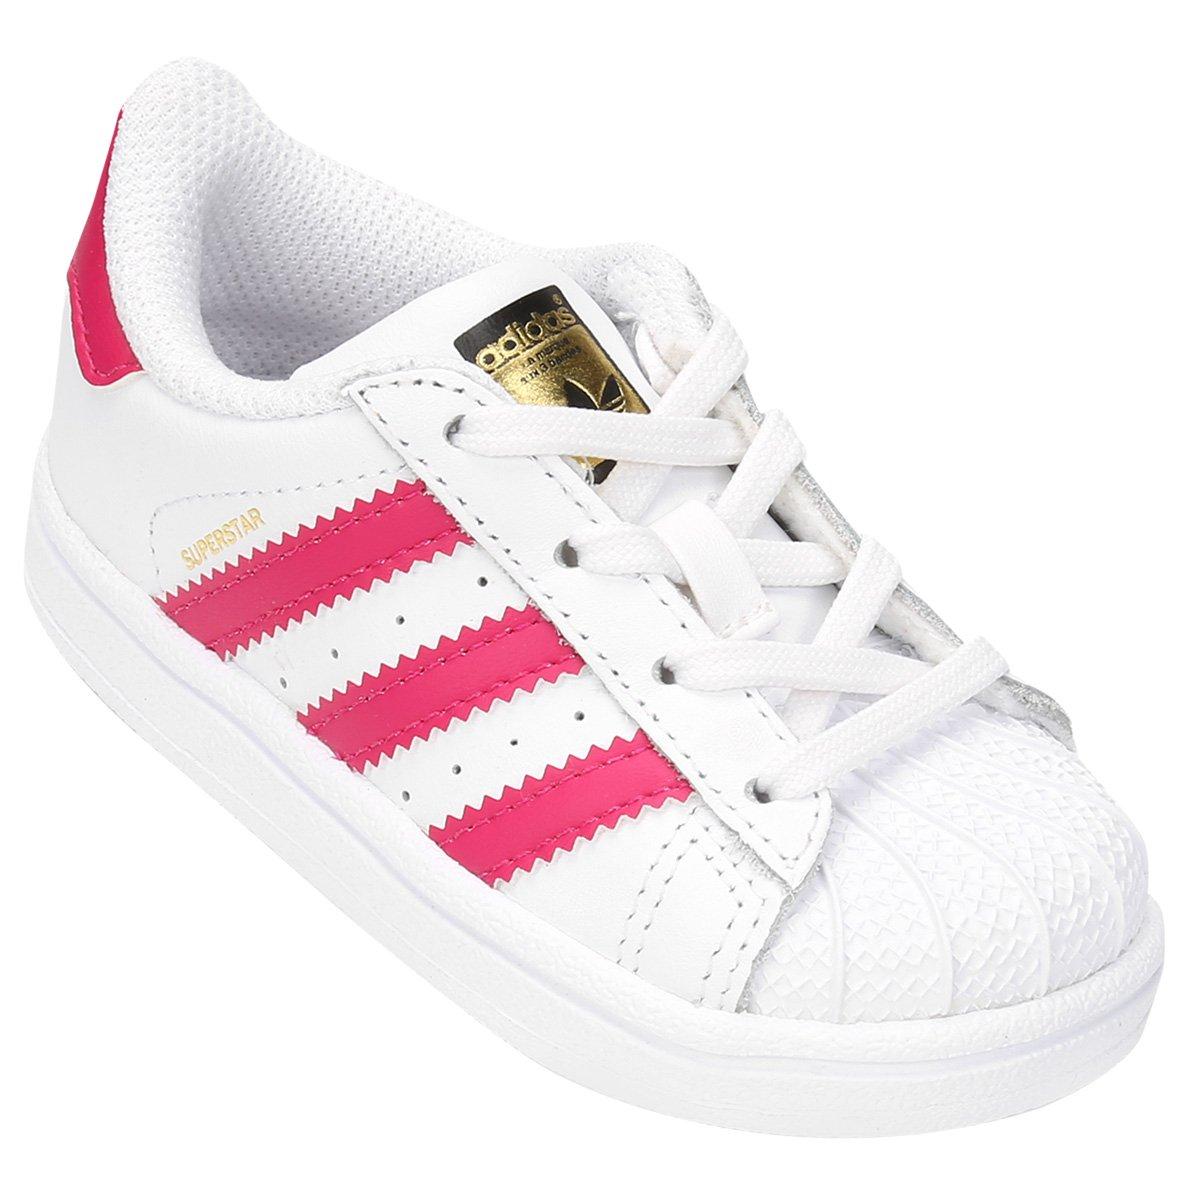 Tênis Adidas Superstar Foundation I Infantil - Branco e Pink ... 66a50f6ff0001